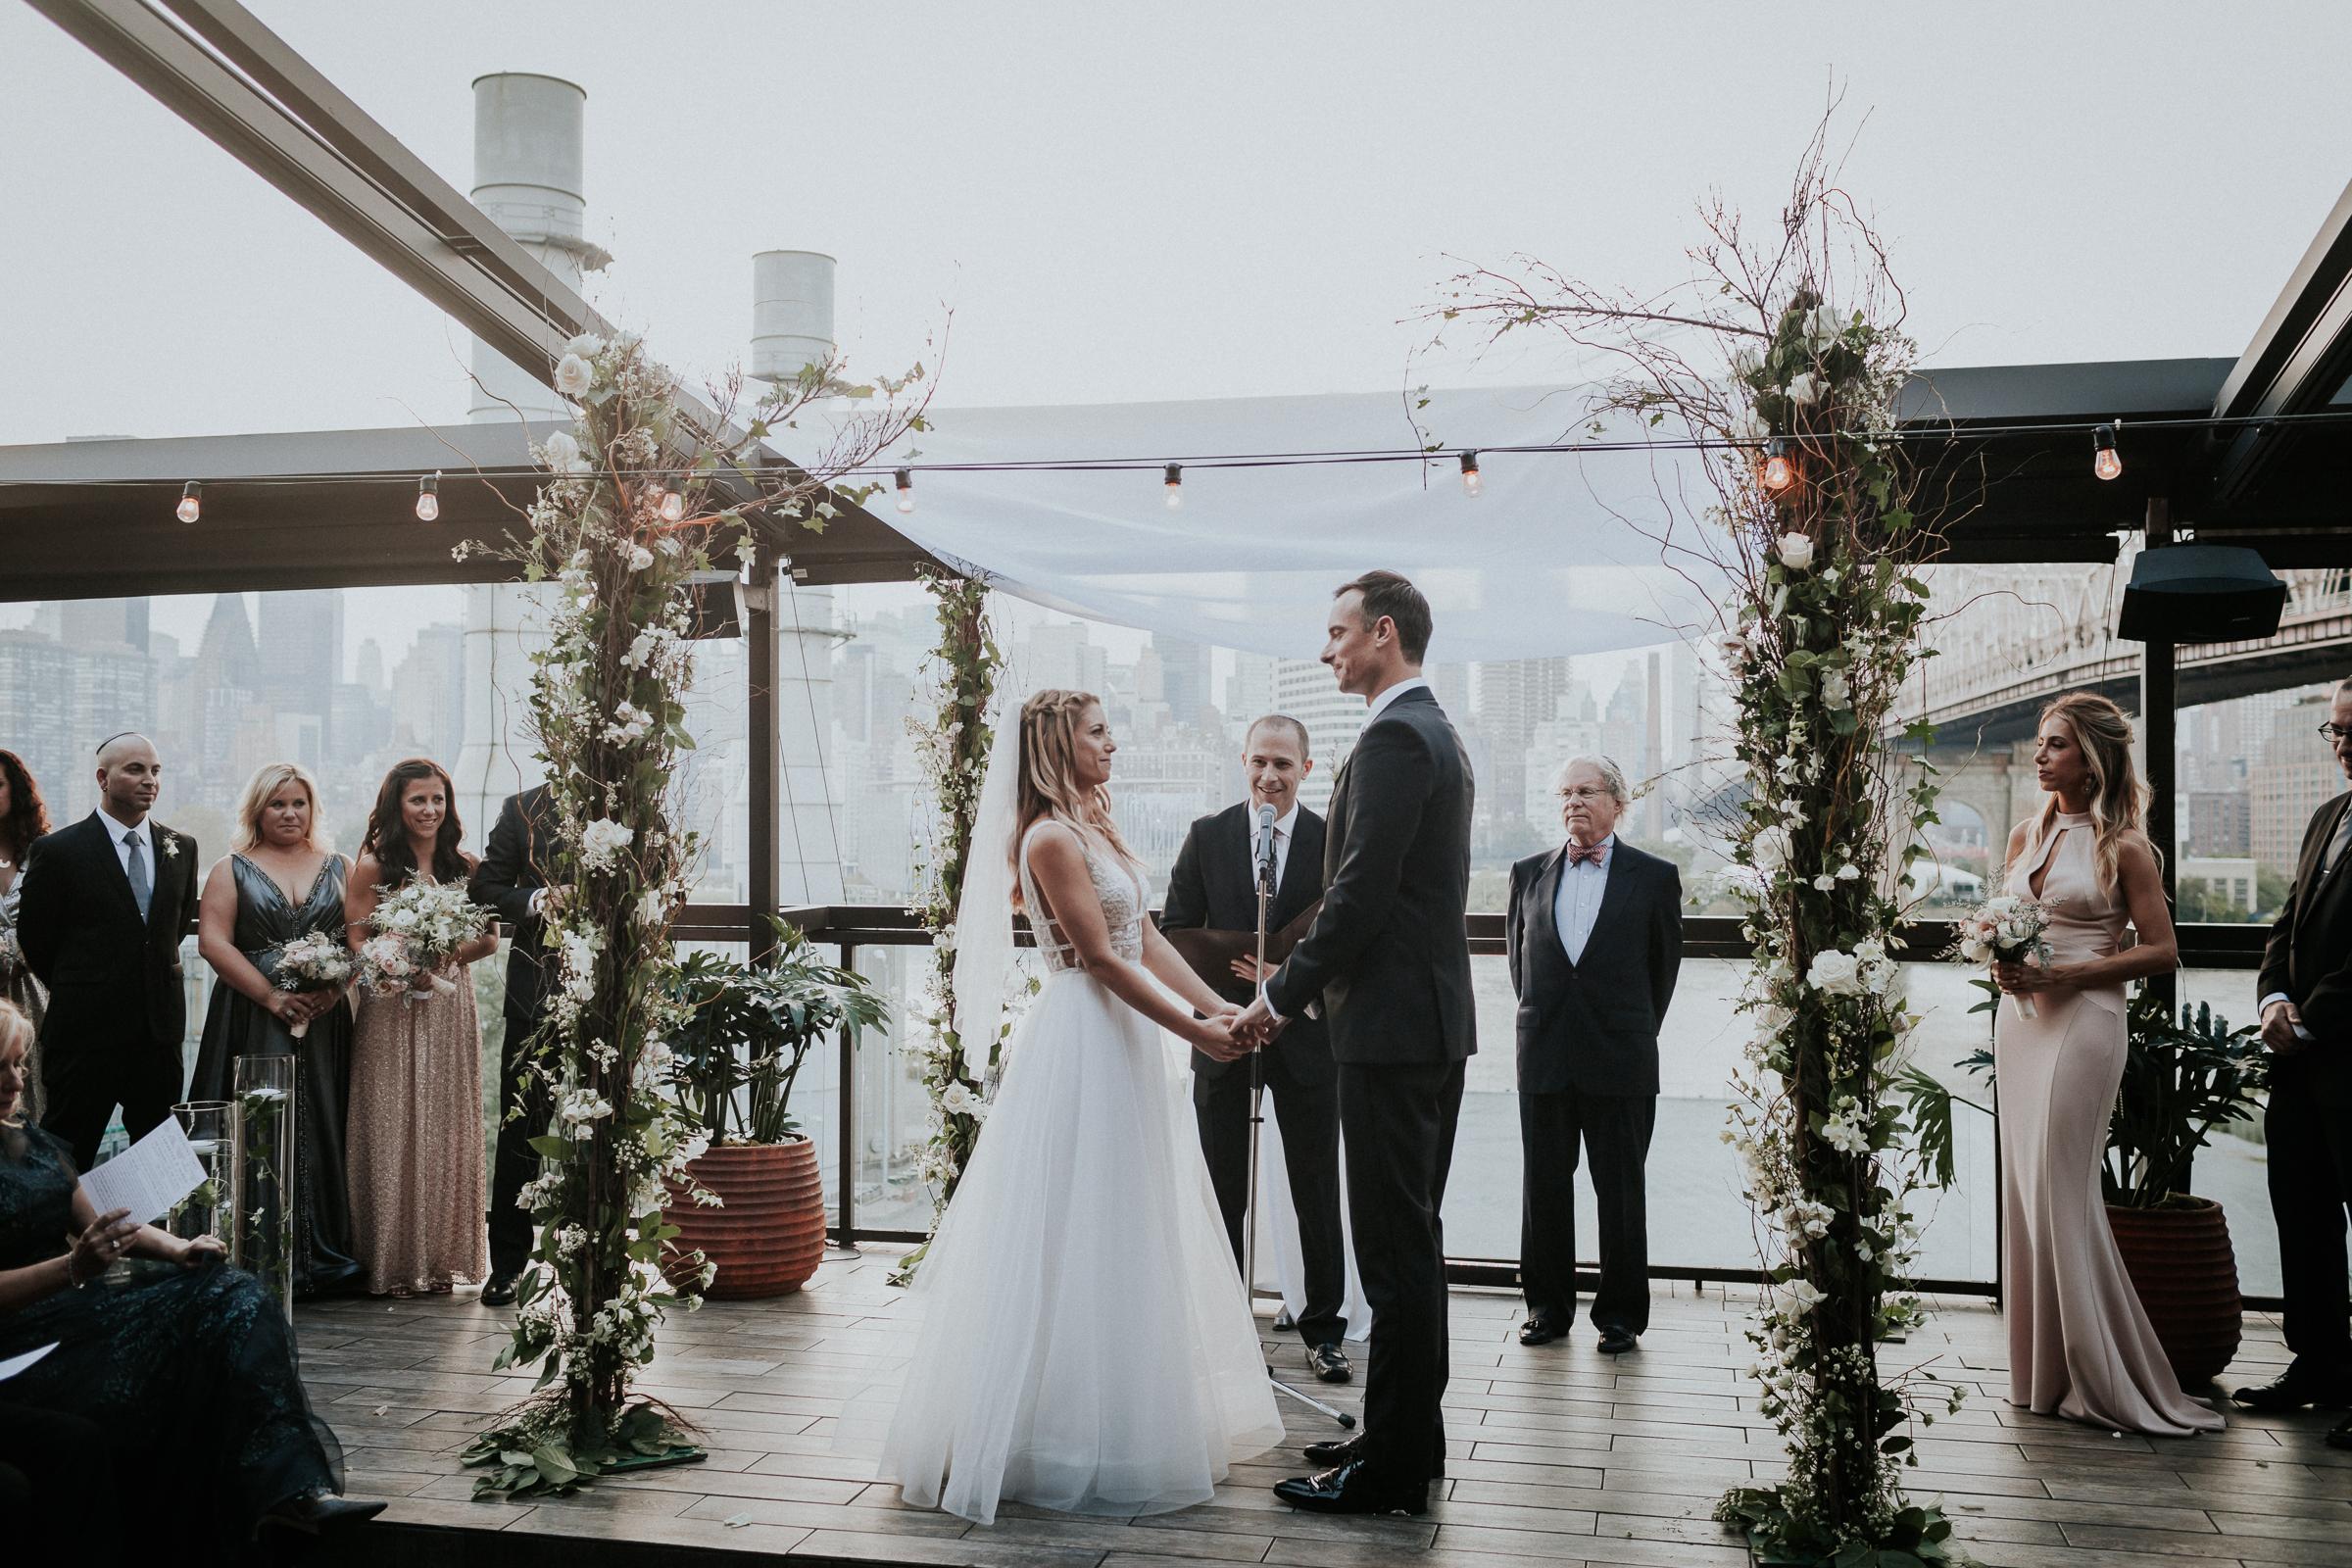 Ravel-Hotel-Penthouse-808-Long-Island-City-New-York-Documentary-Wedding-Photographer-69.jpg